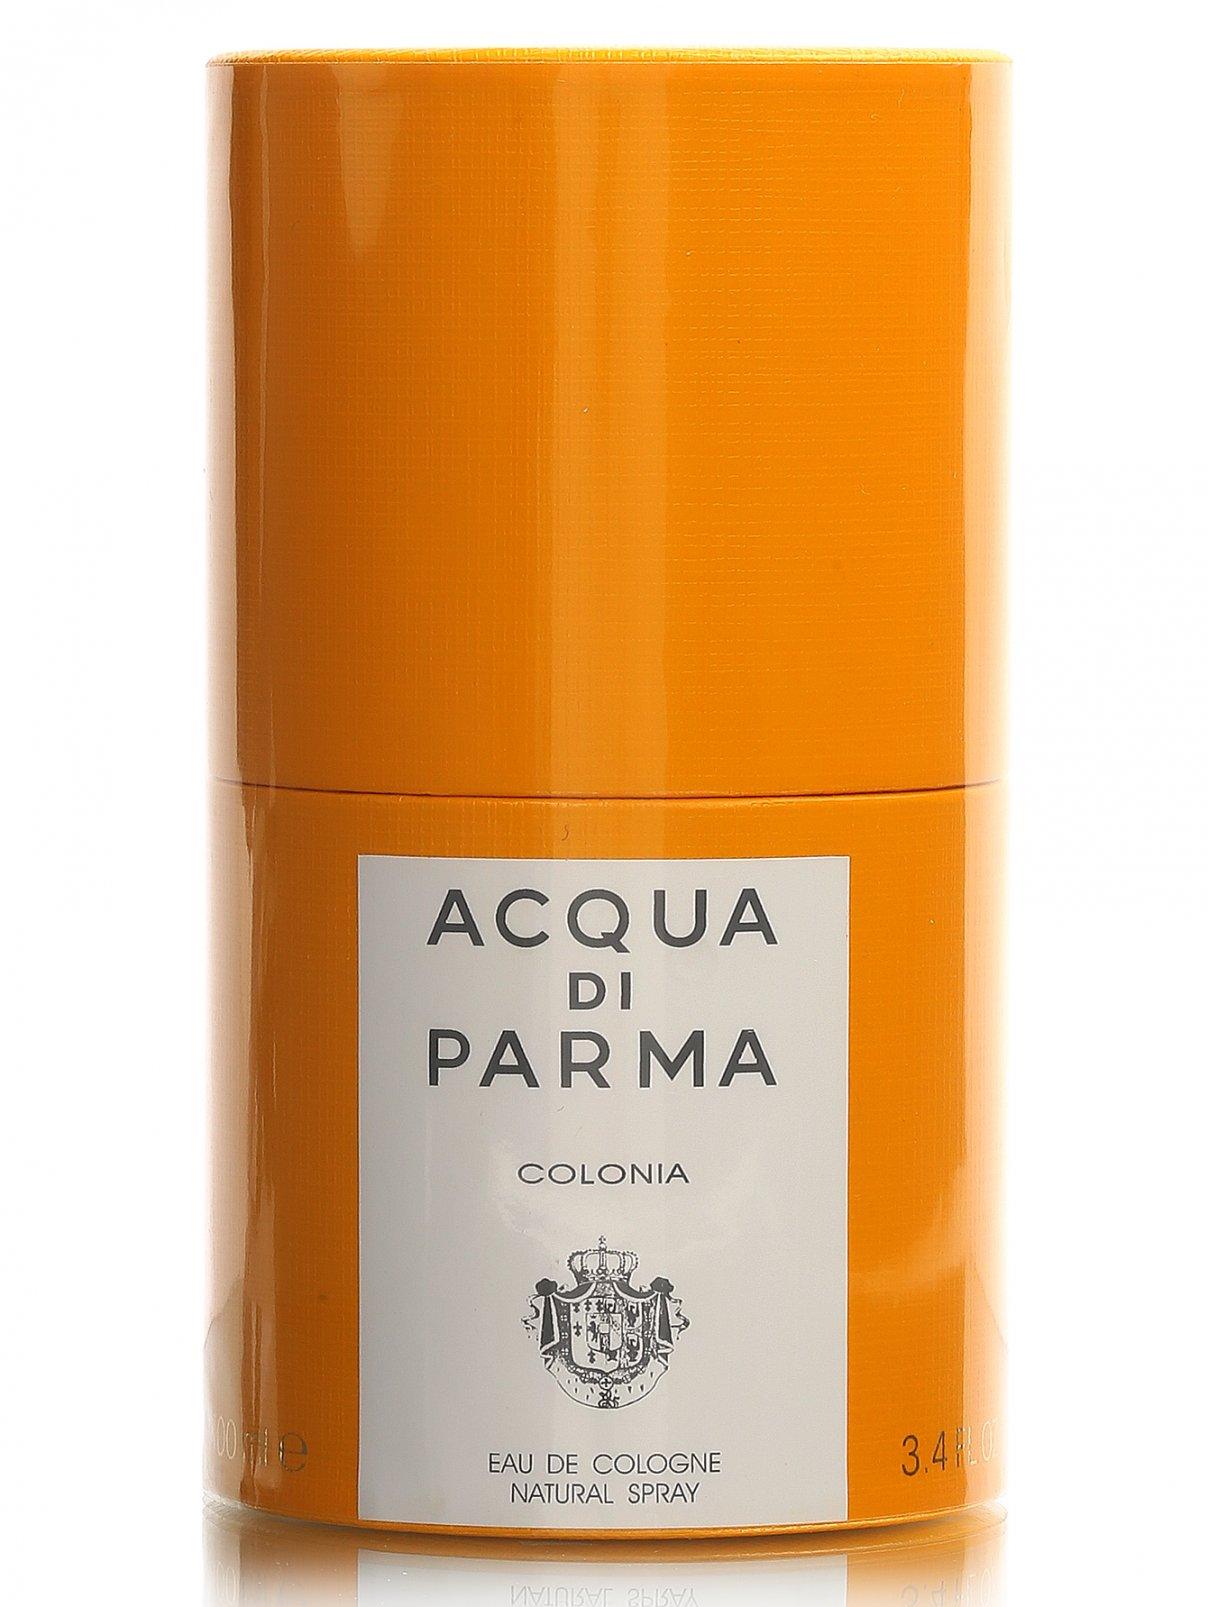 Одеколон - Colonia, 100ml Acqua di Parma  –  Модель Общий вид